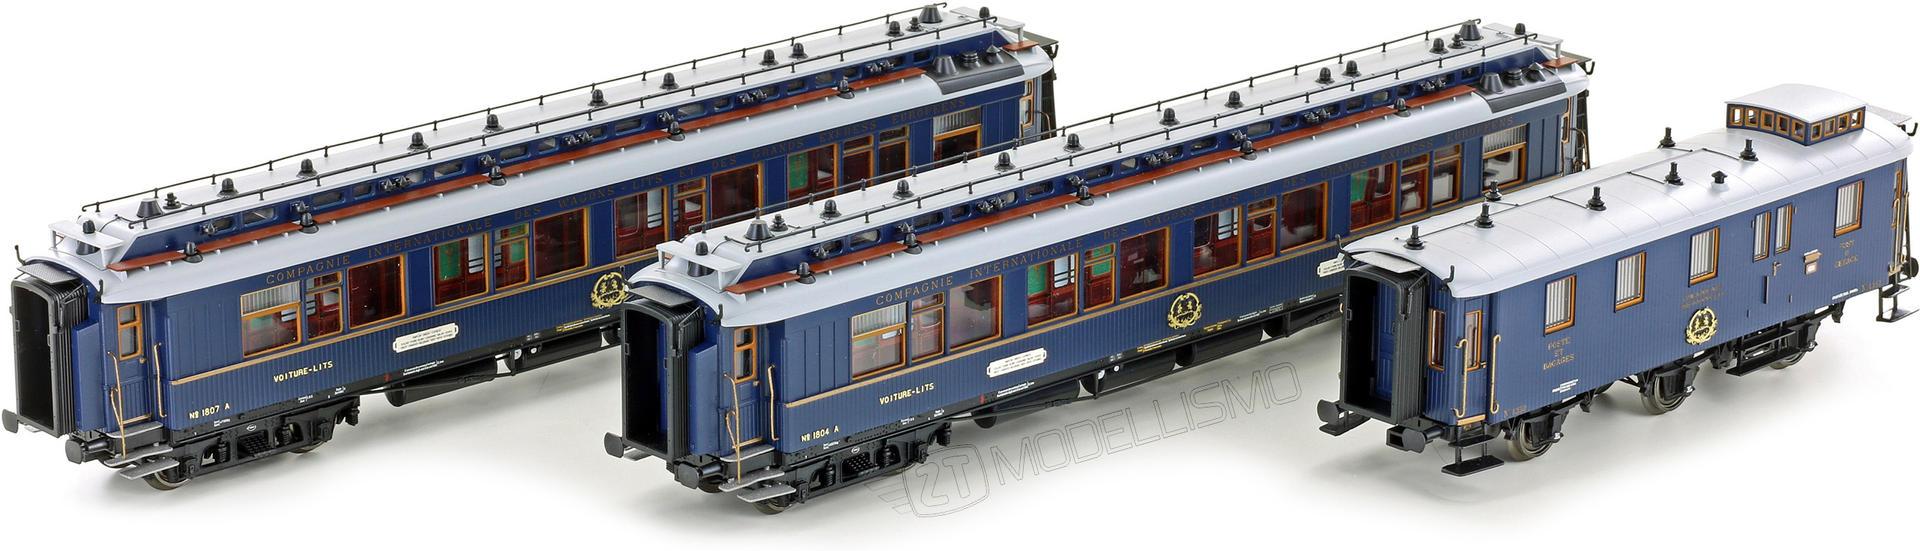 Hobby Train H44022